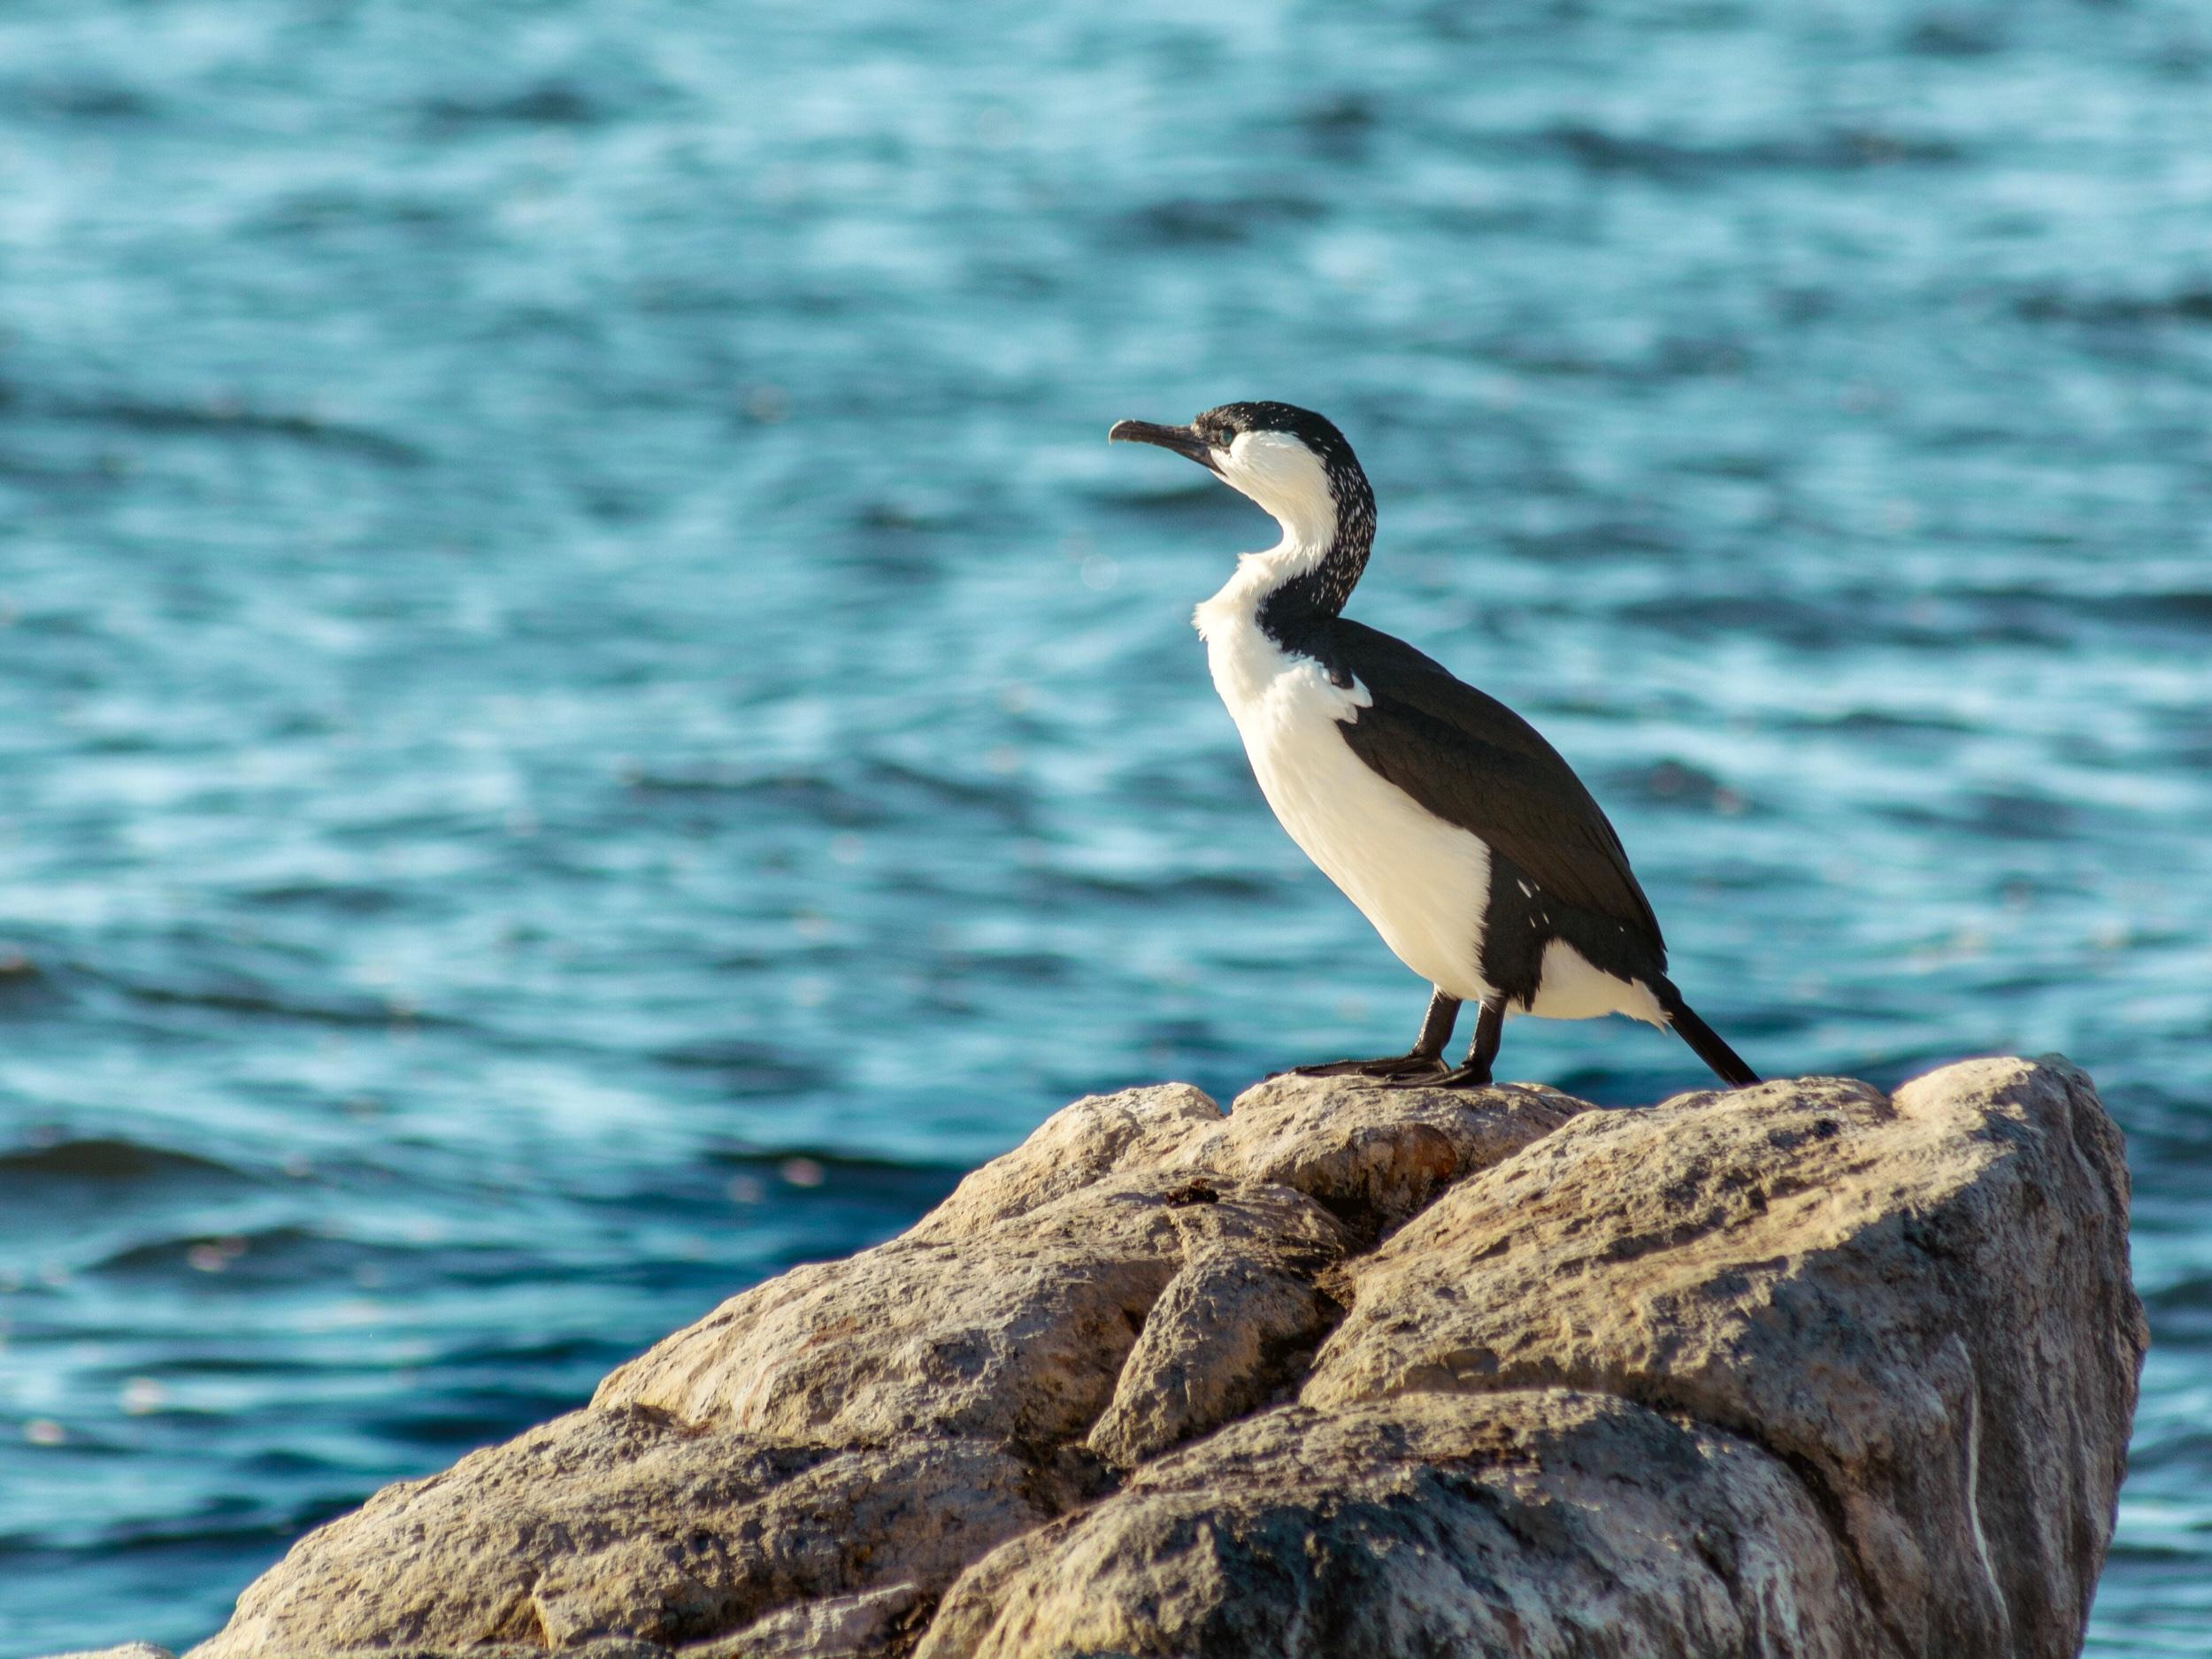 Phalacrocorax fuscescens | Sandy Bay, Hobart | D7100 | (2019)